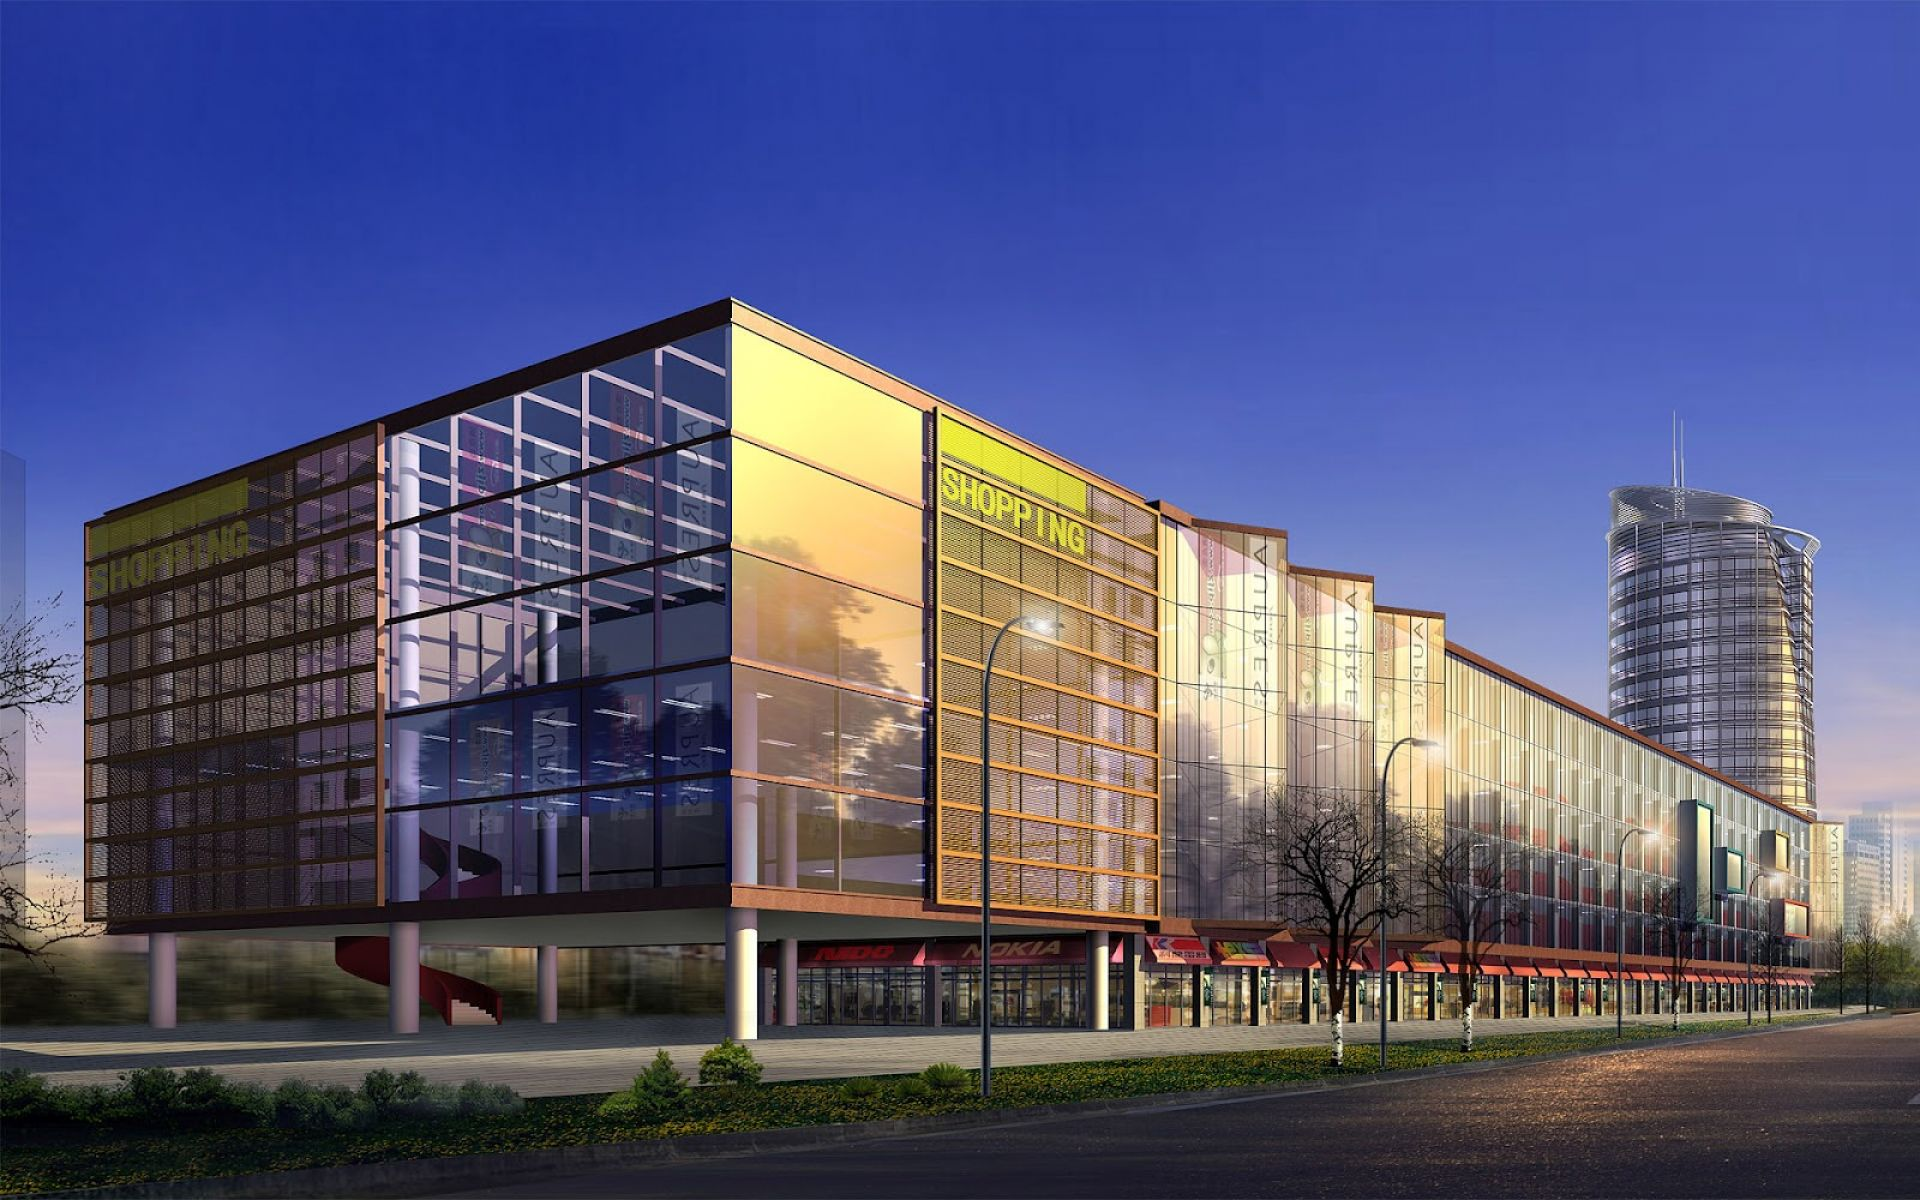 Big shopping center architecture